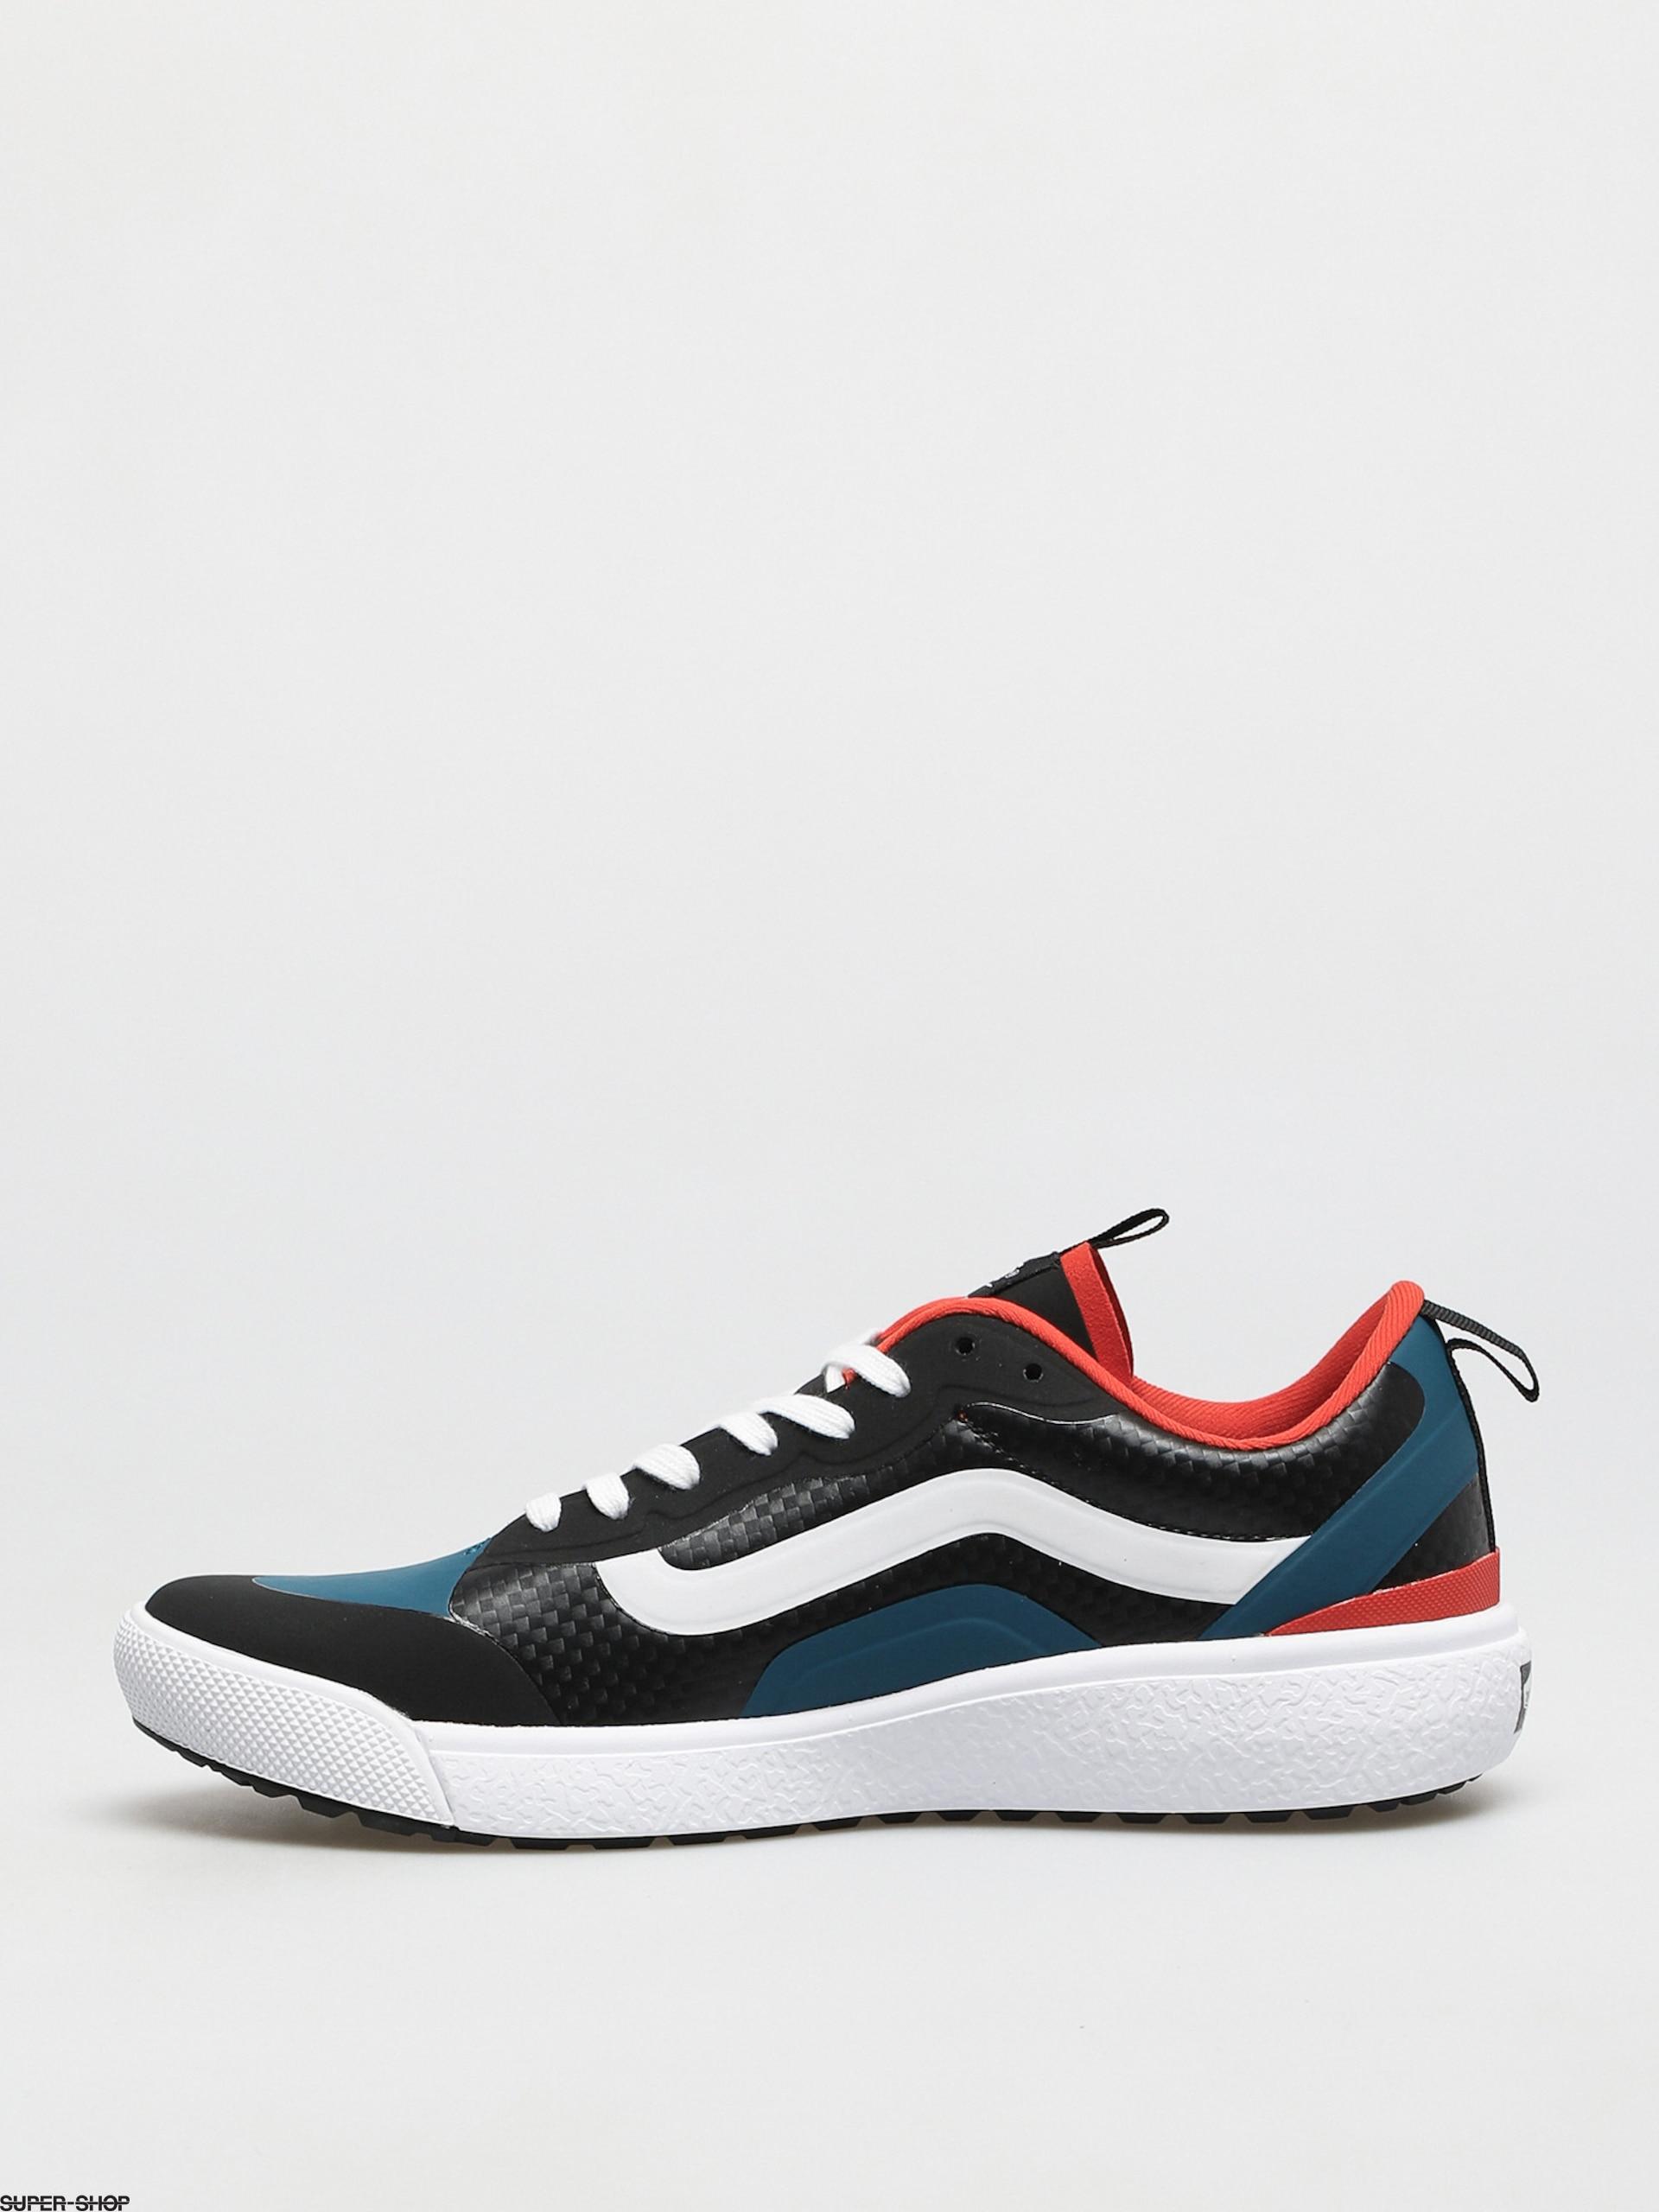 Vans Ultrarange Exo Shoes (carbon/blk/electric orng)